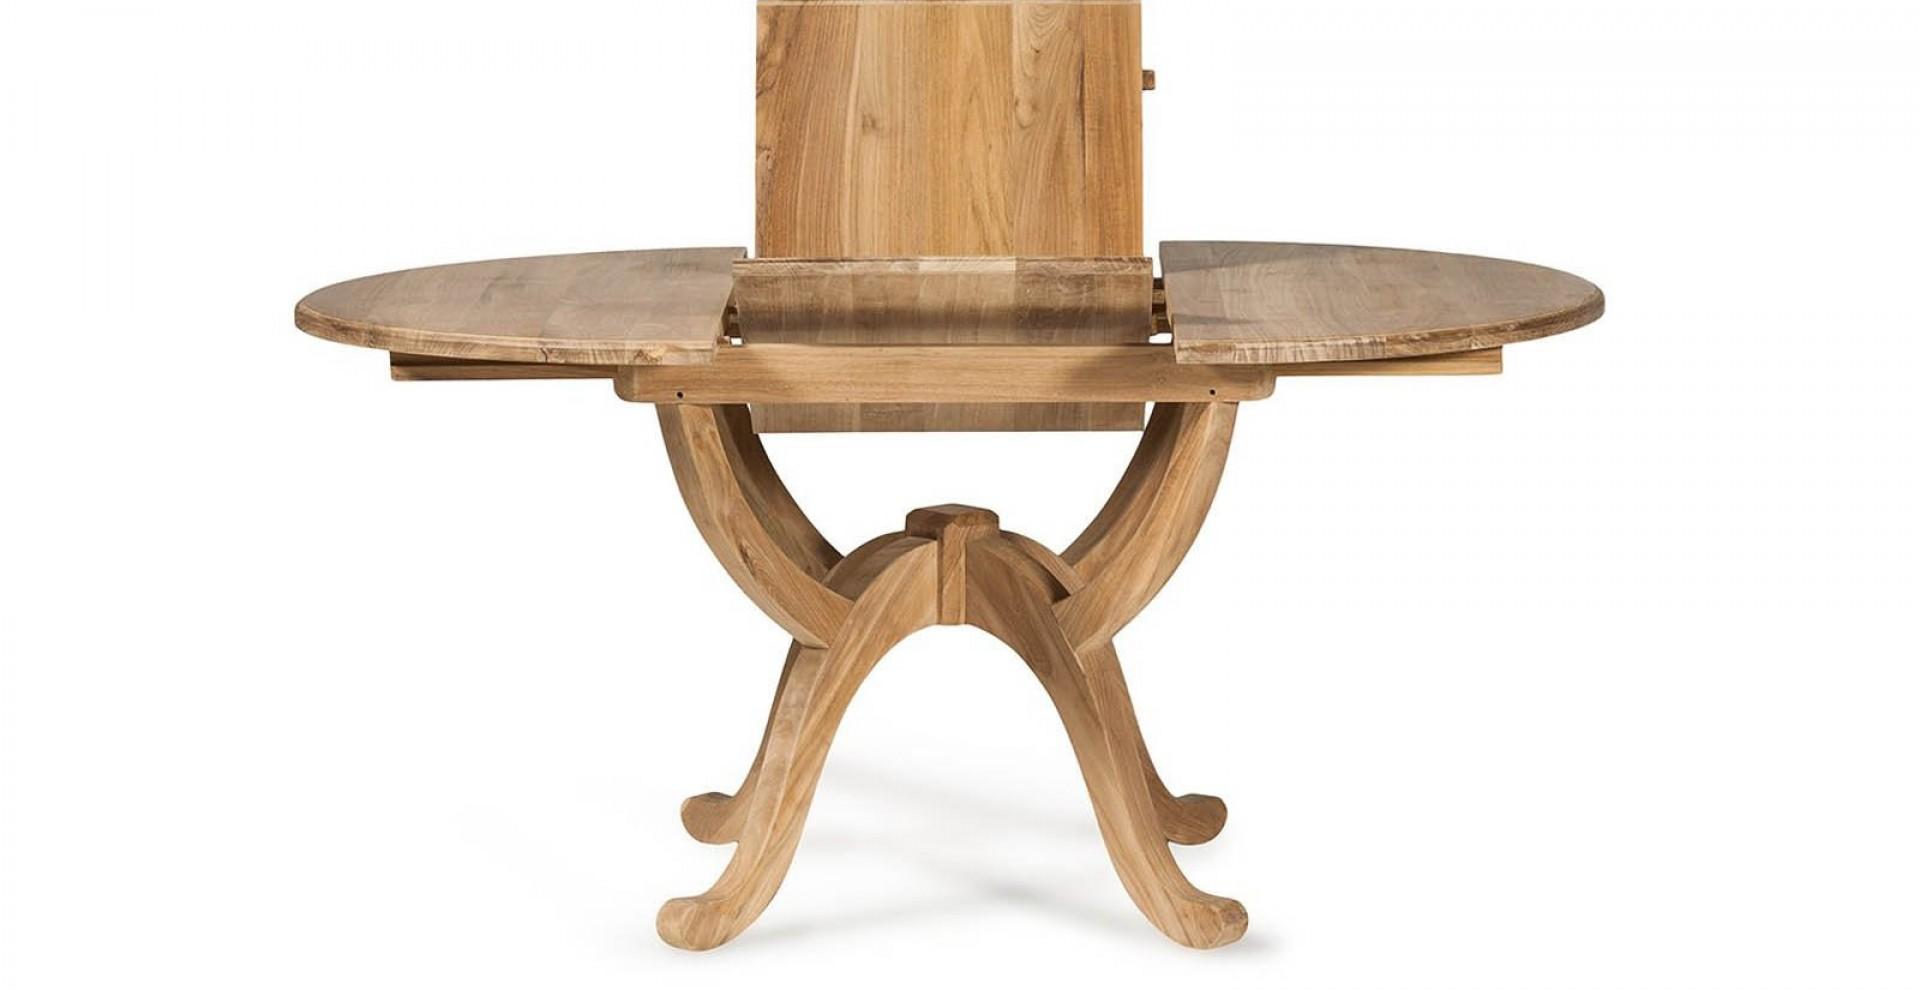 tisch astor oval id ausziehbar. Black Bedroom Furniture Sets. Home Design Ideas